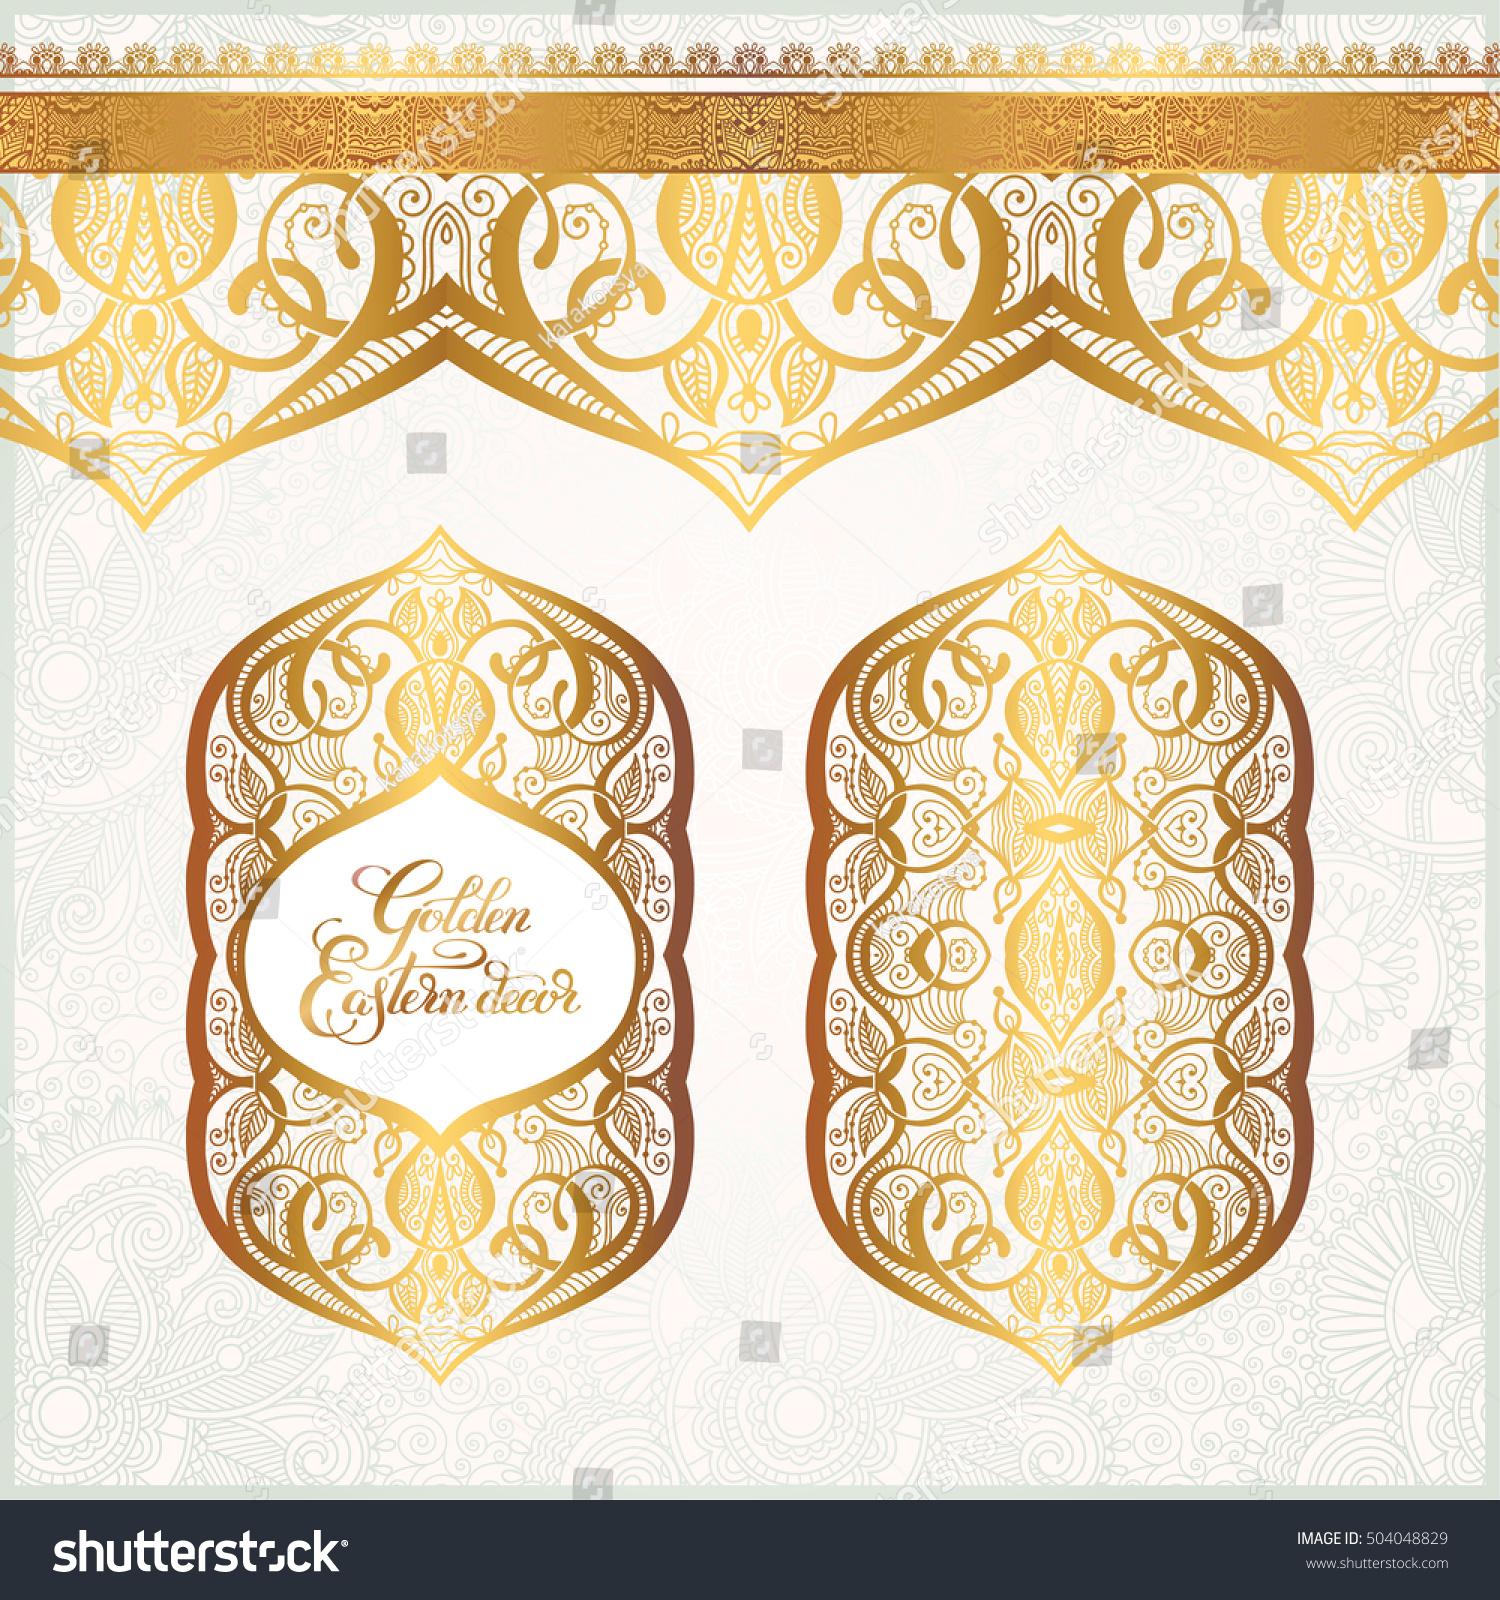 Floral Golden Eastern Decor Place Your Stock Illustration 504048829